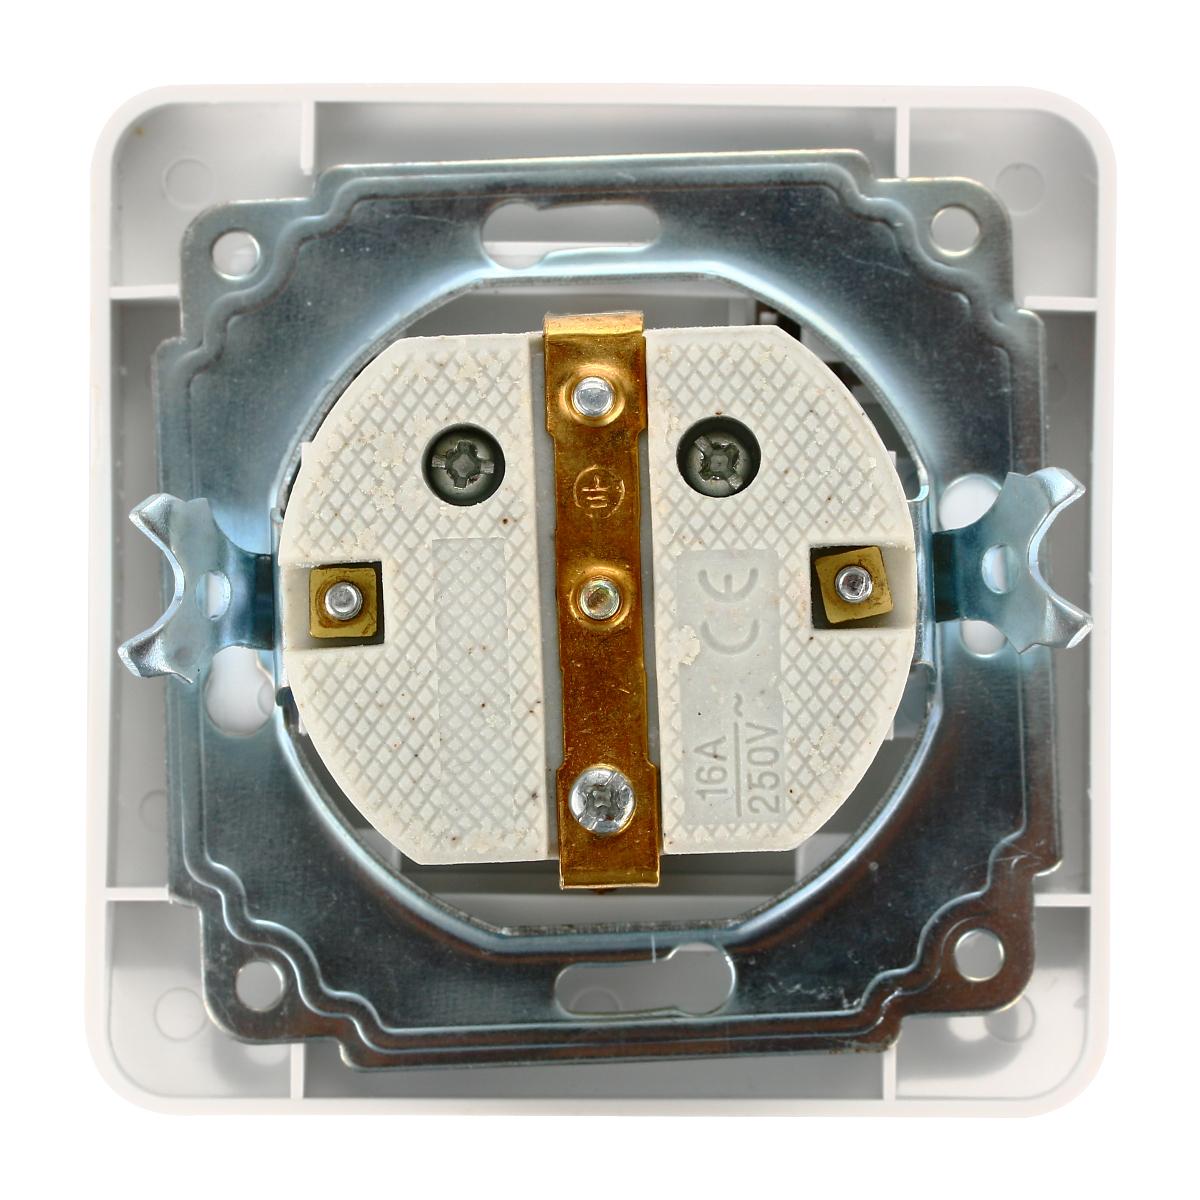 european electronic wiring diagrams 16a 250v korea wiring receptacle power outlet schuko ...